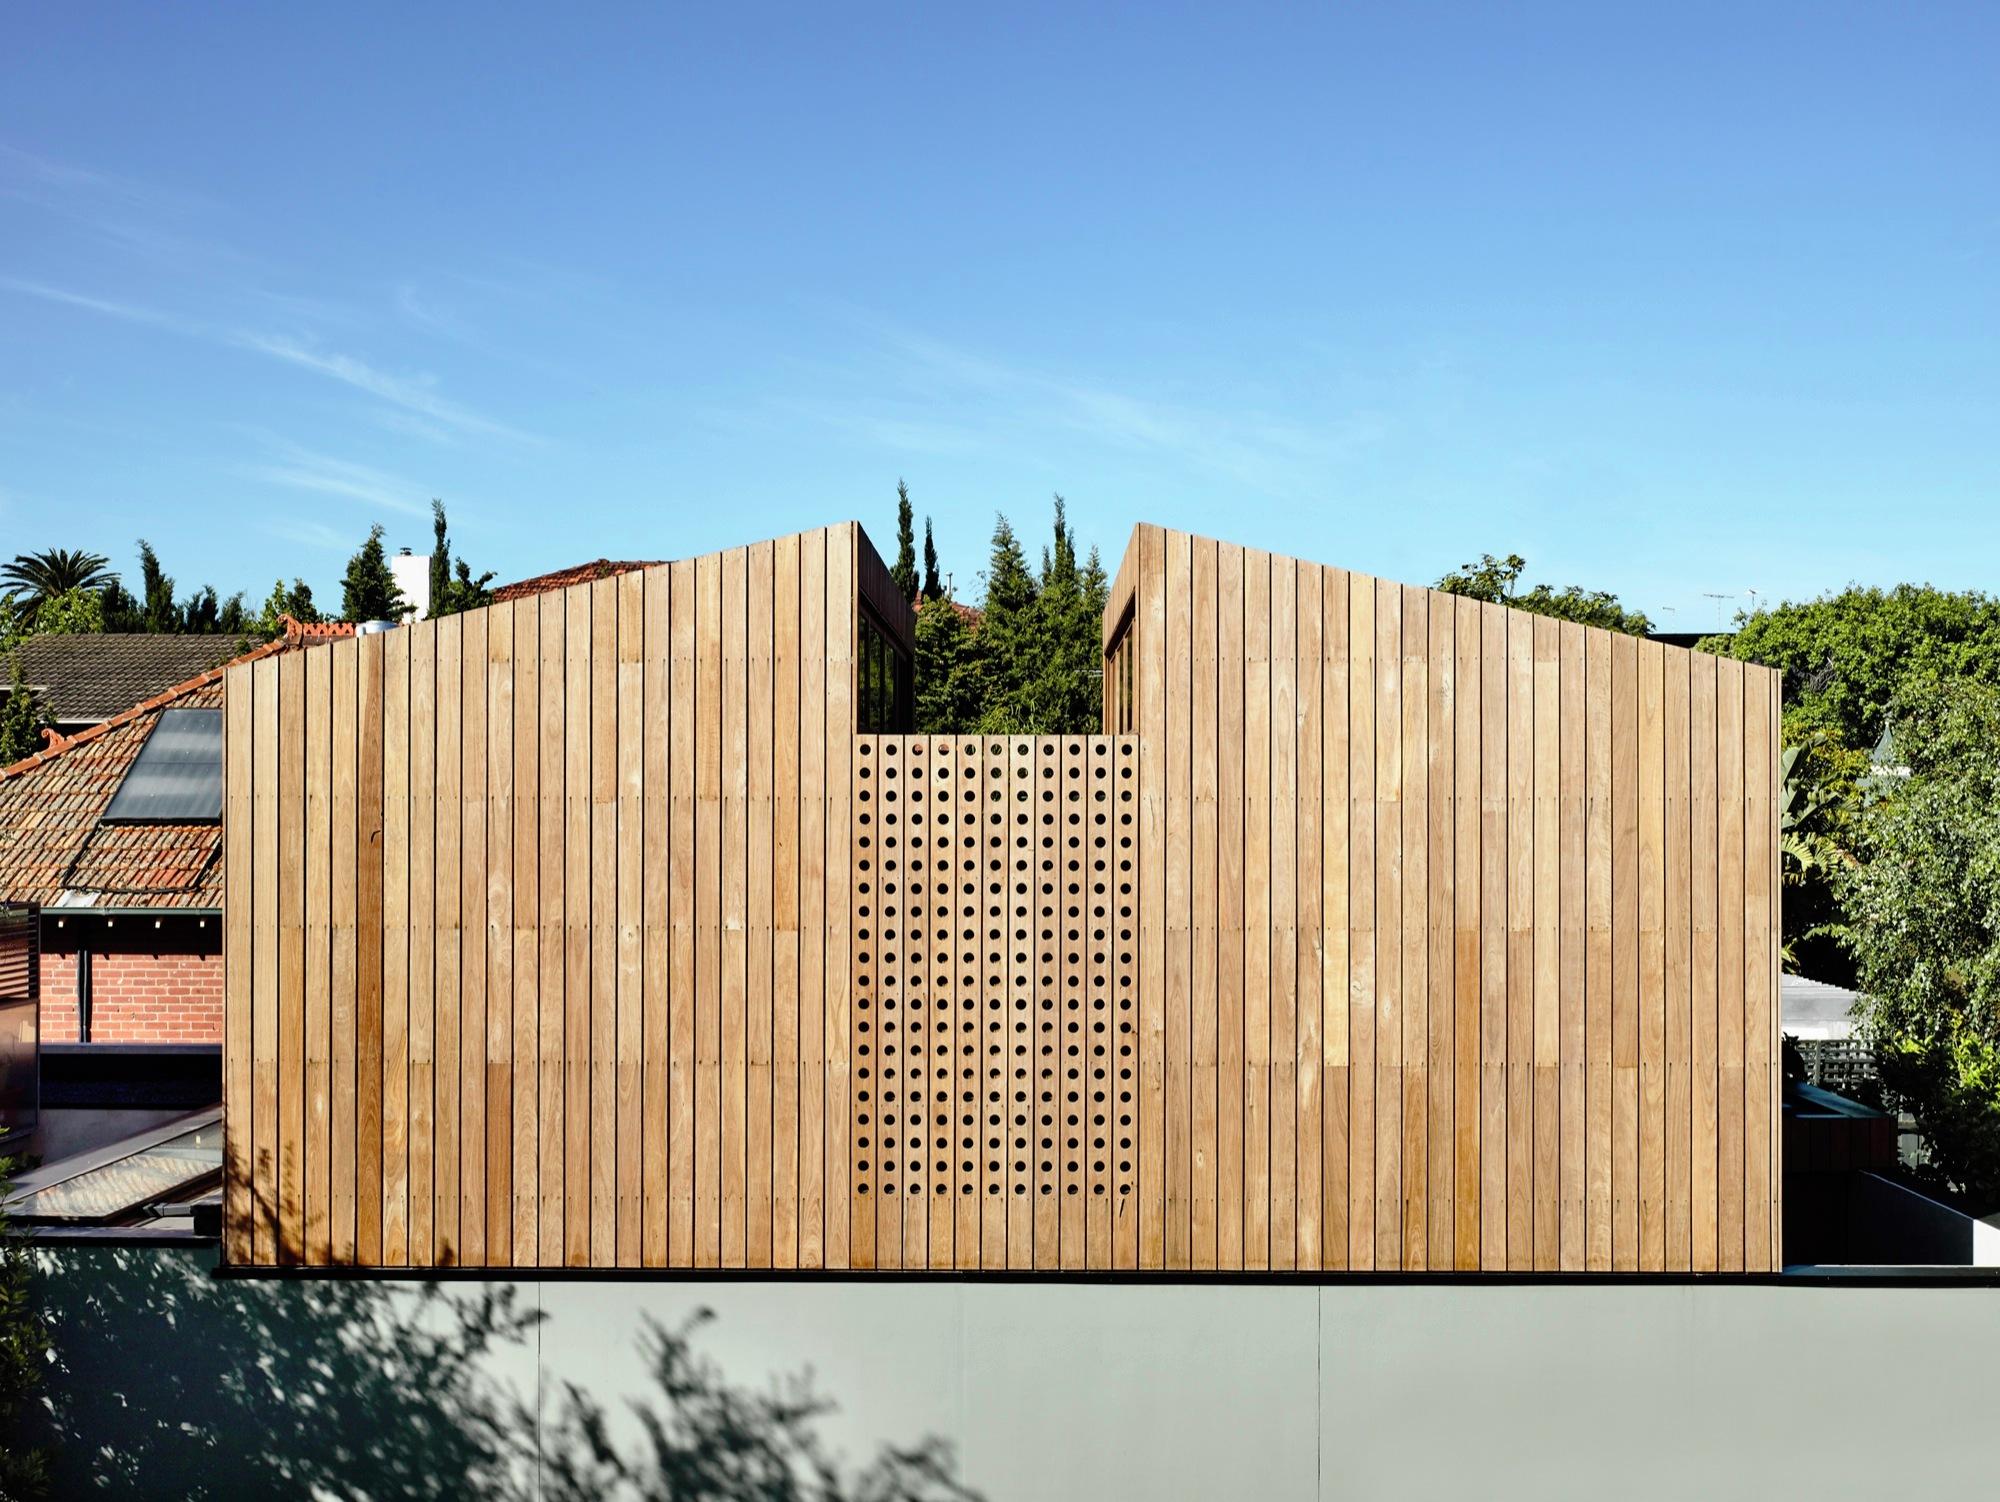 Beach Ave Schulberg Demkiw Architects Archdaily